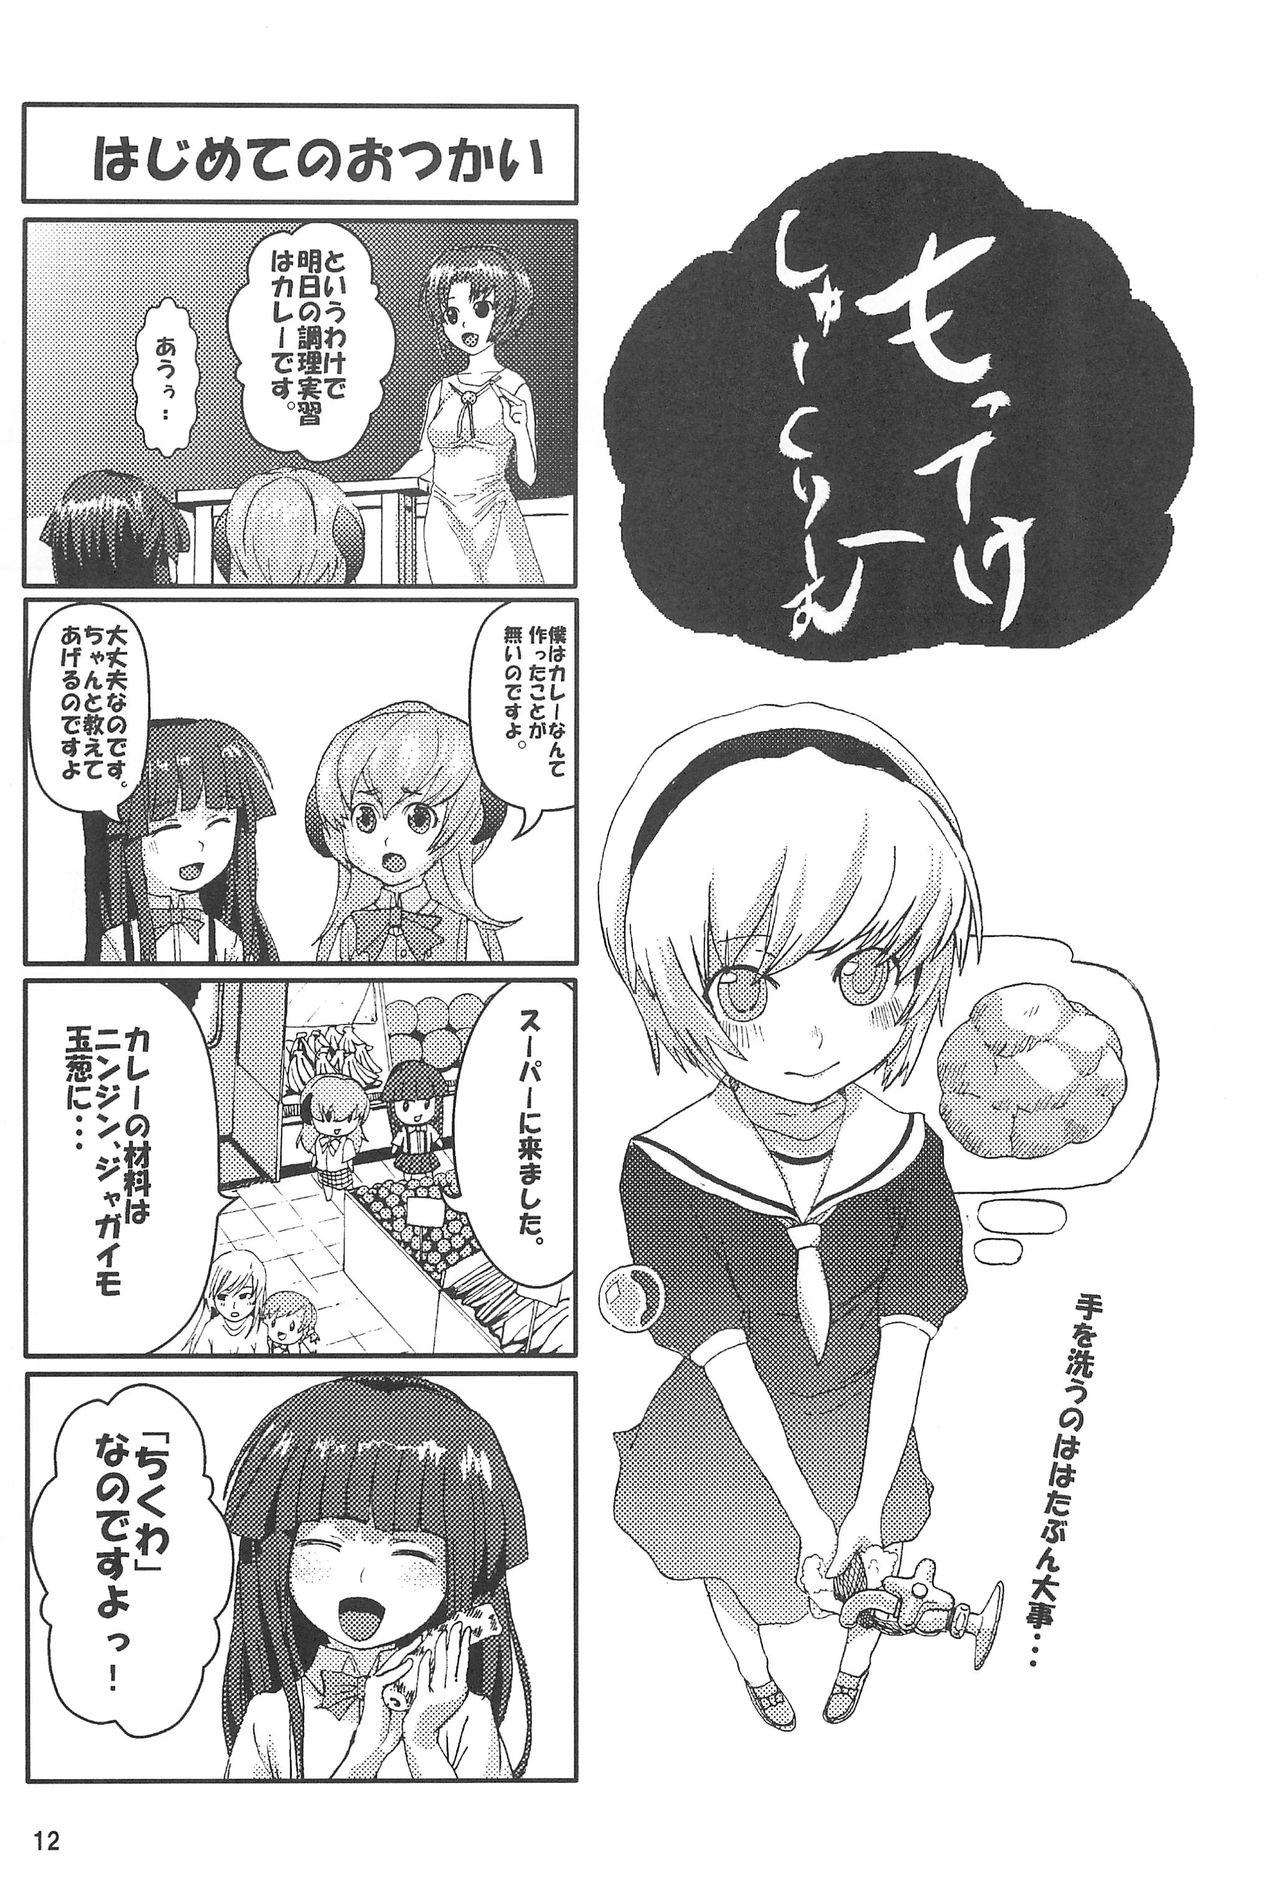 ) Mitsukushi 15